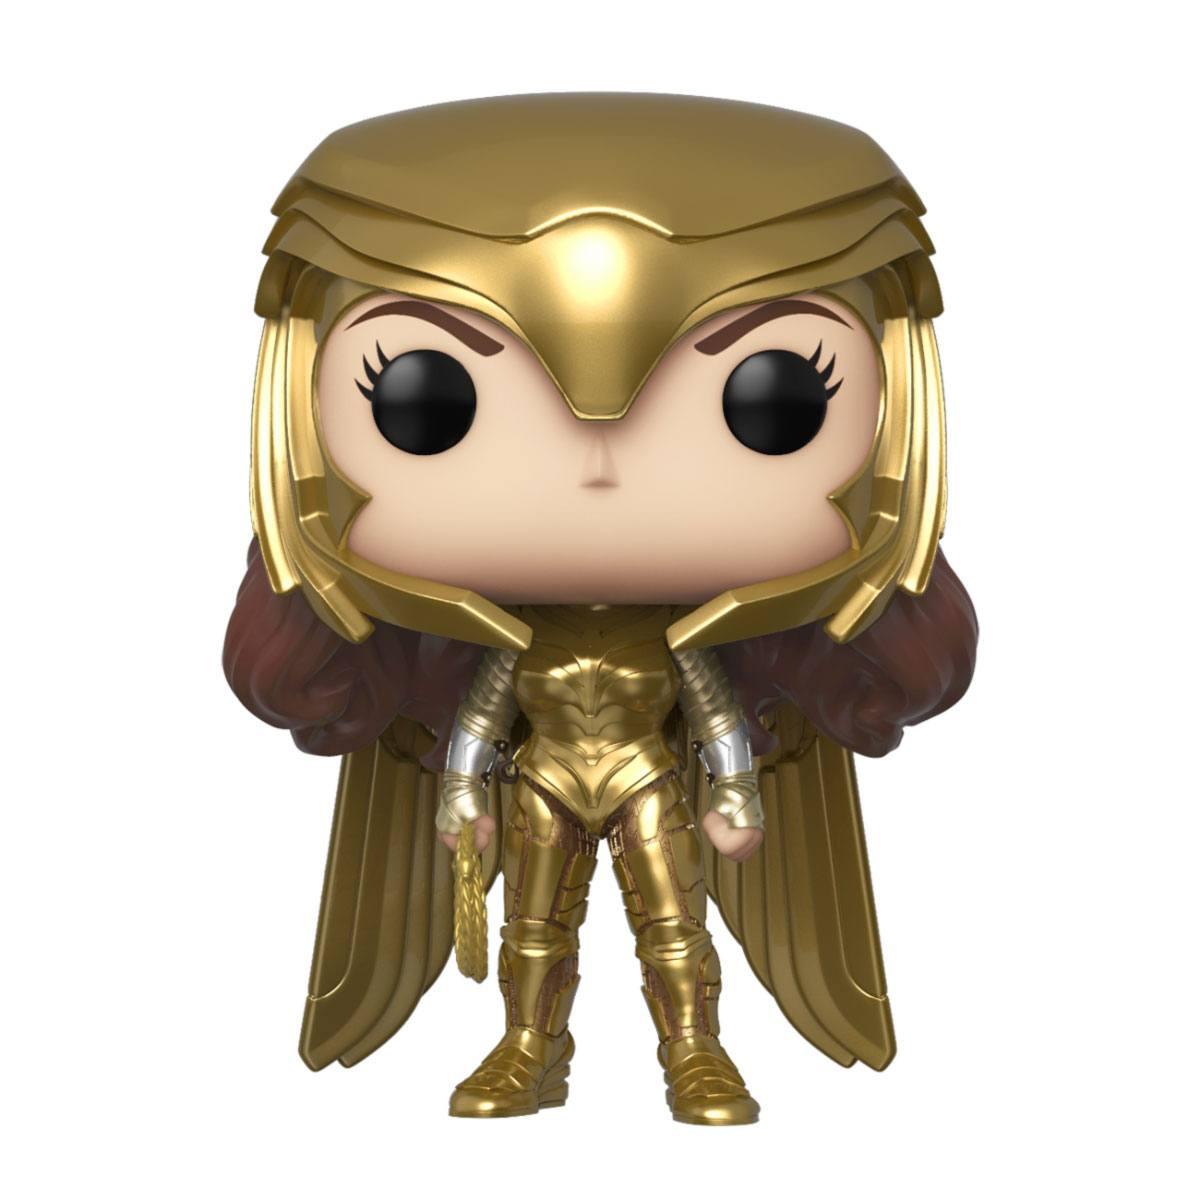 Wonder Woman 1984 POP! Movies Vinyl Figure Wonder Woman Gold Armour Power Pose 9 cm